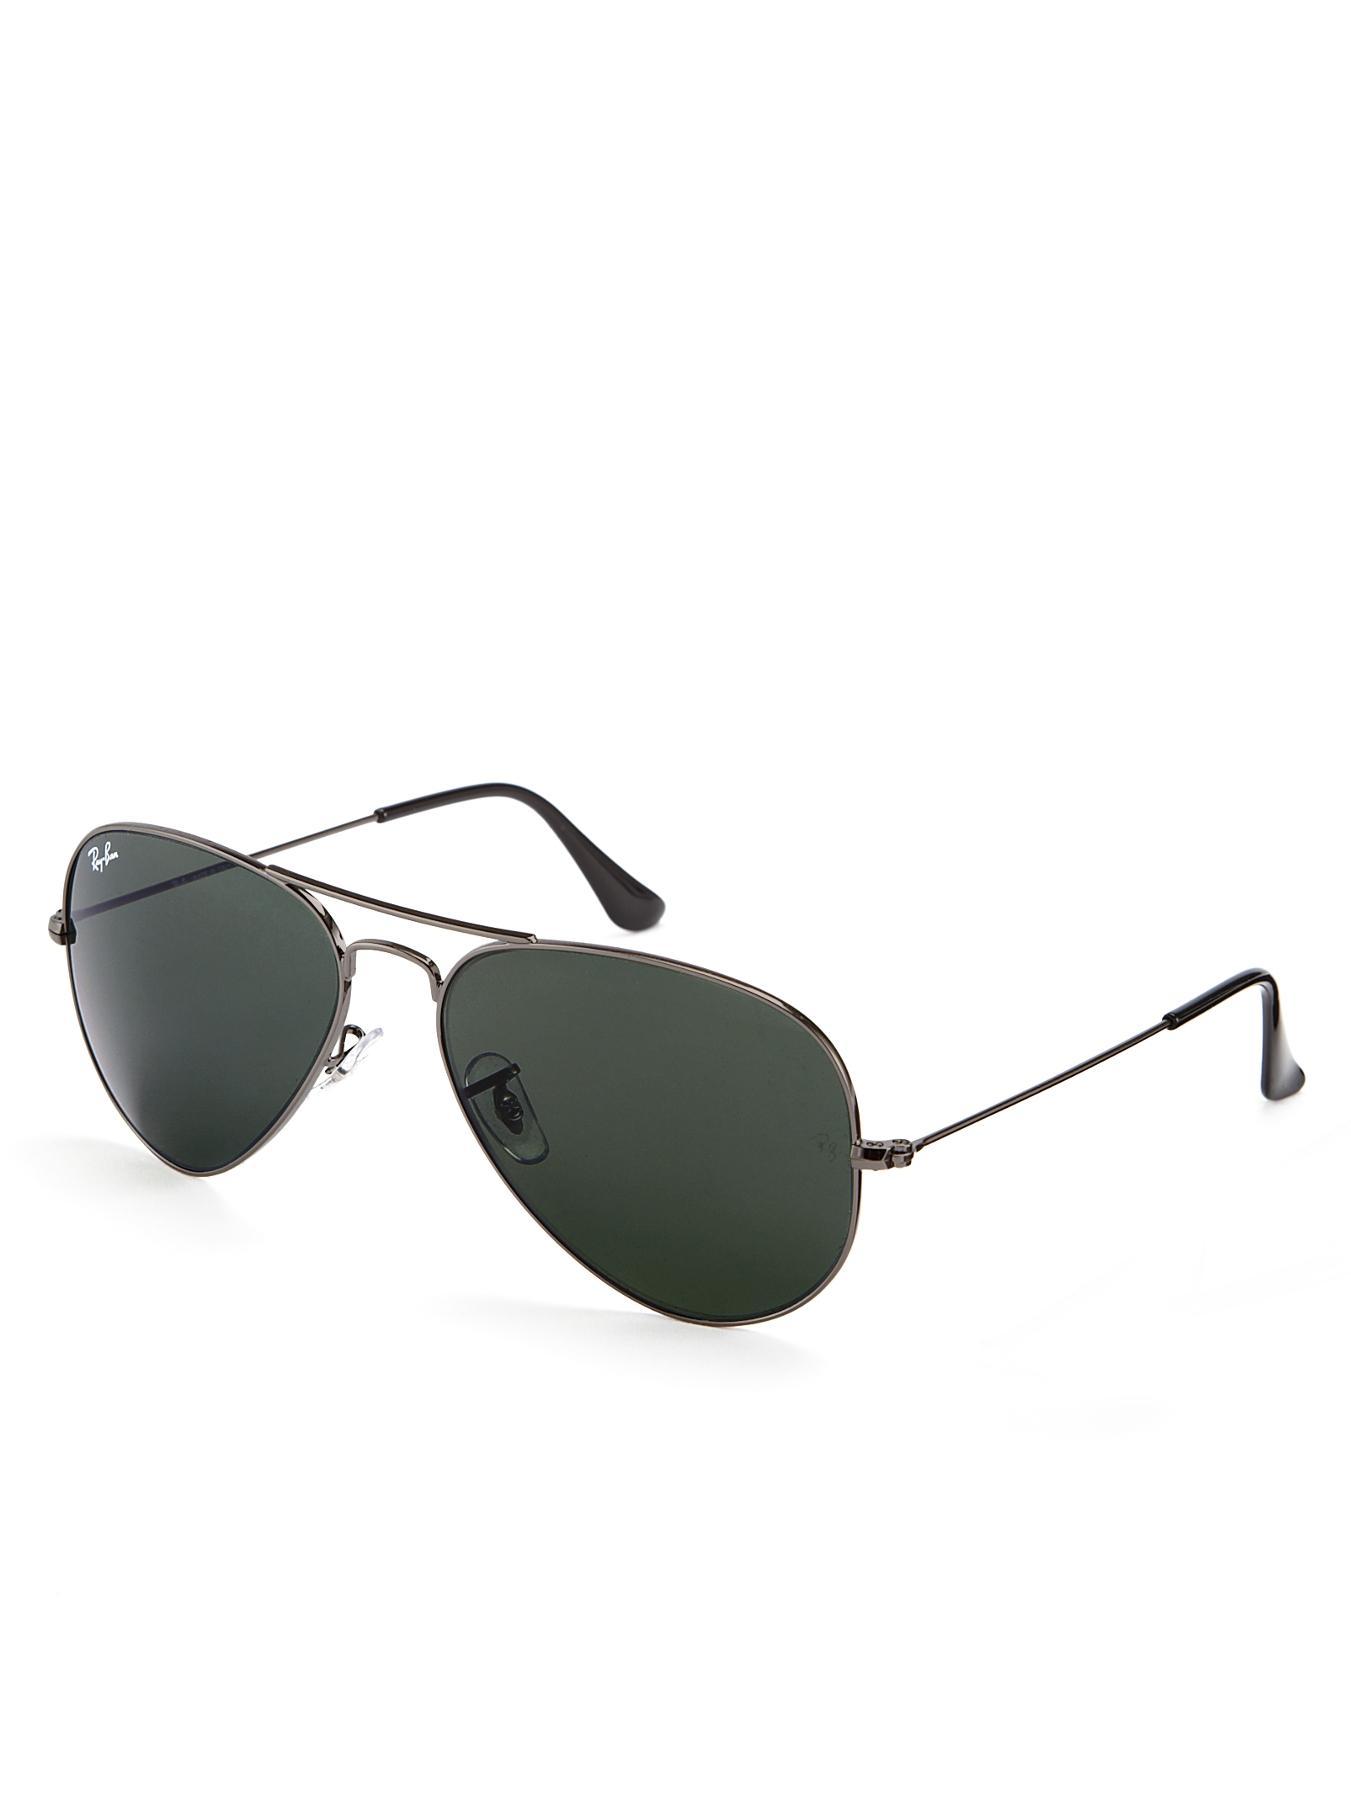 cheap ray ban aviator sunglasses uk